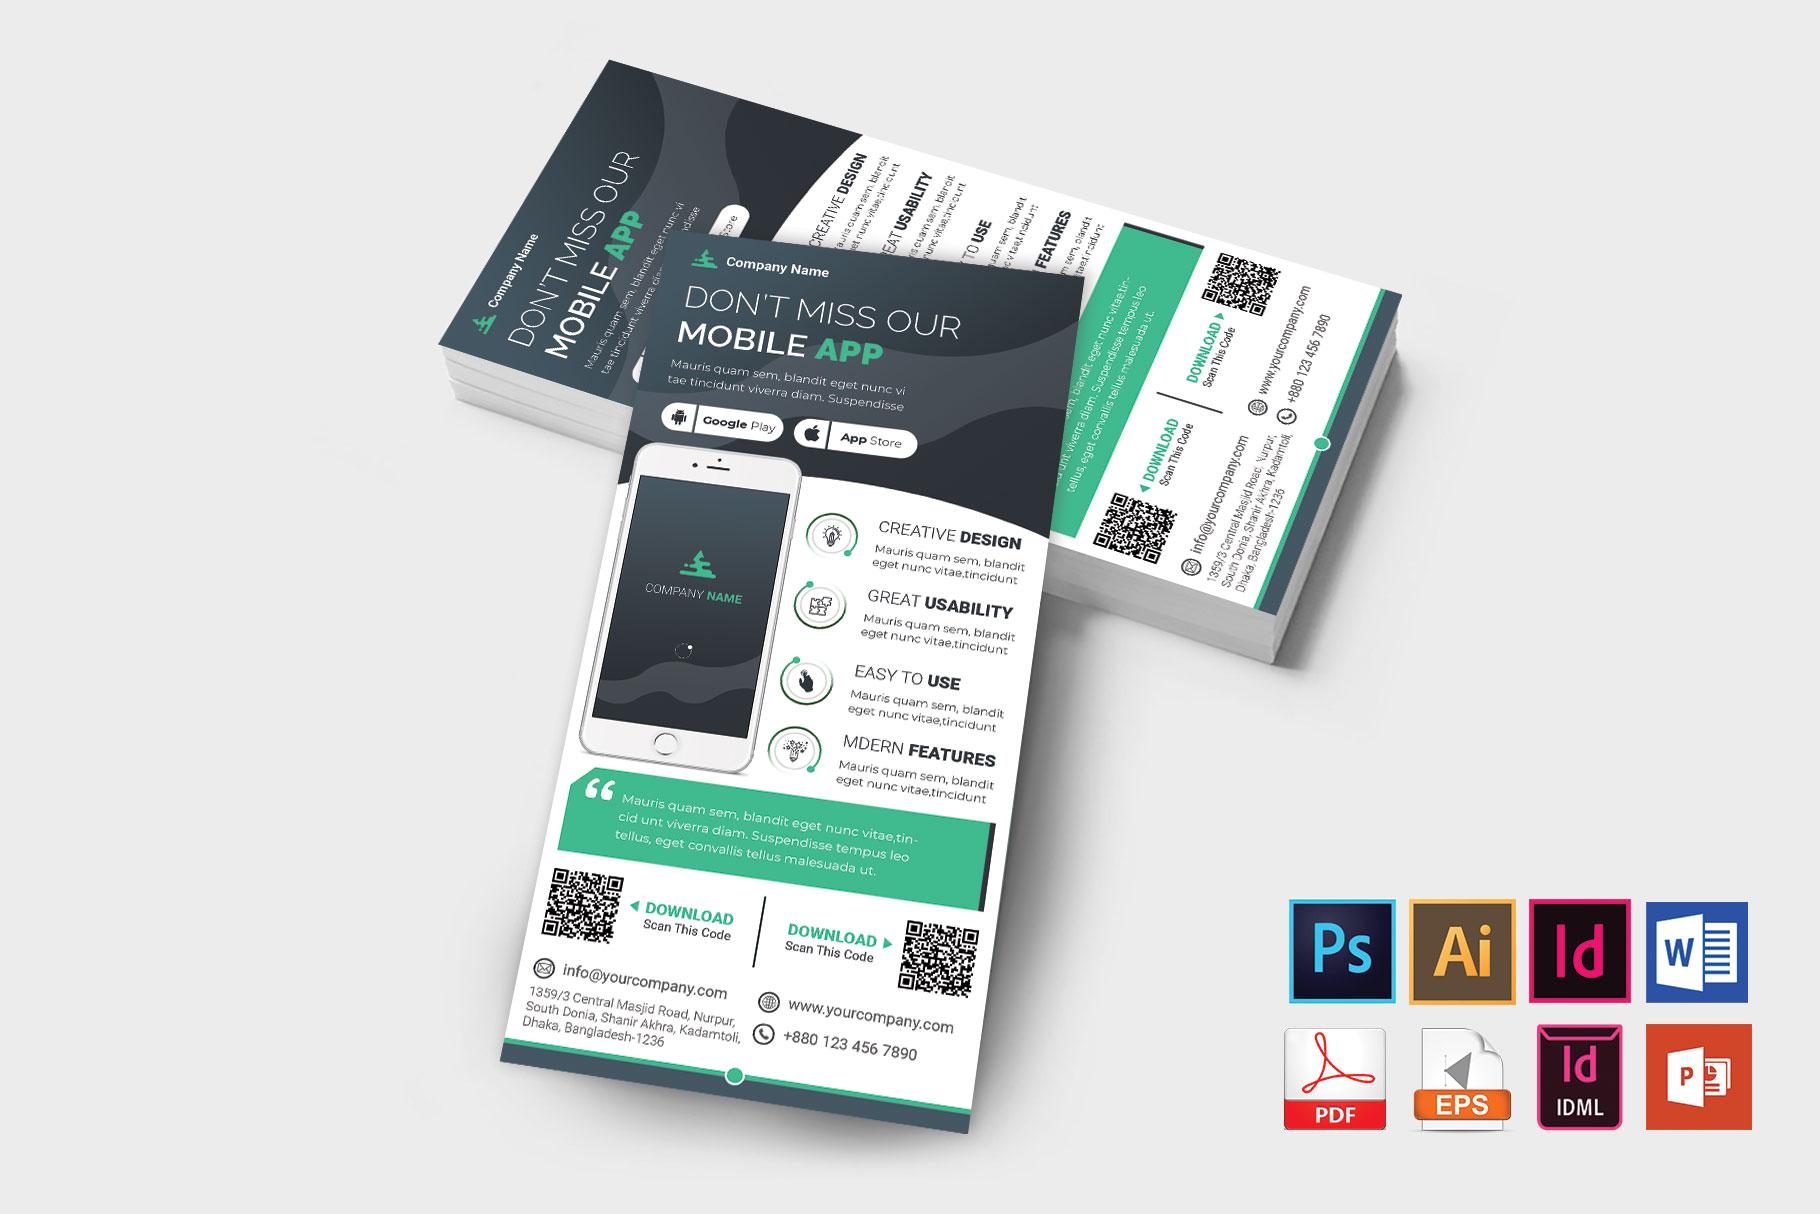 Mobile App Promotion DL Flyer Vol-02 example image 2